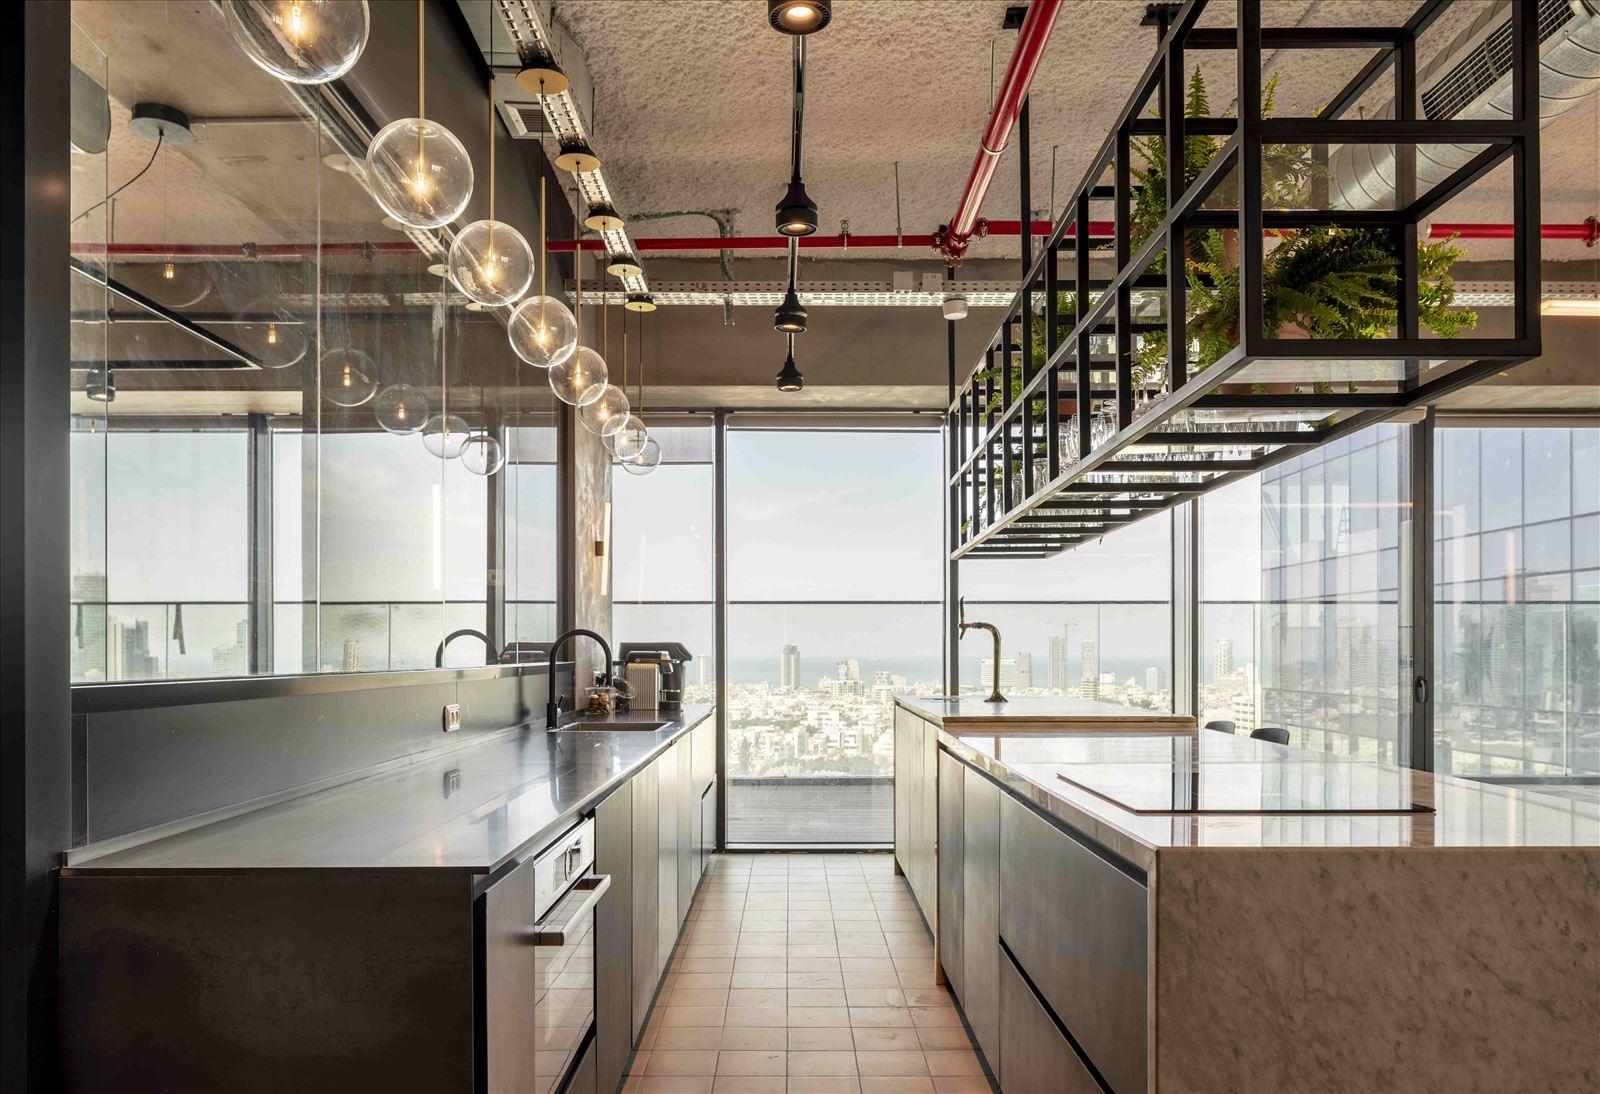 Office project גופי תאורה במטבח מבית דורי קמחי